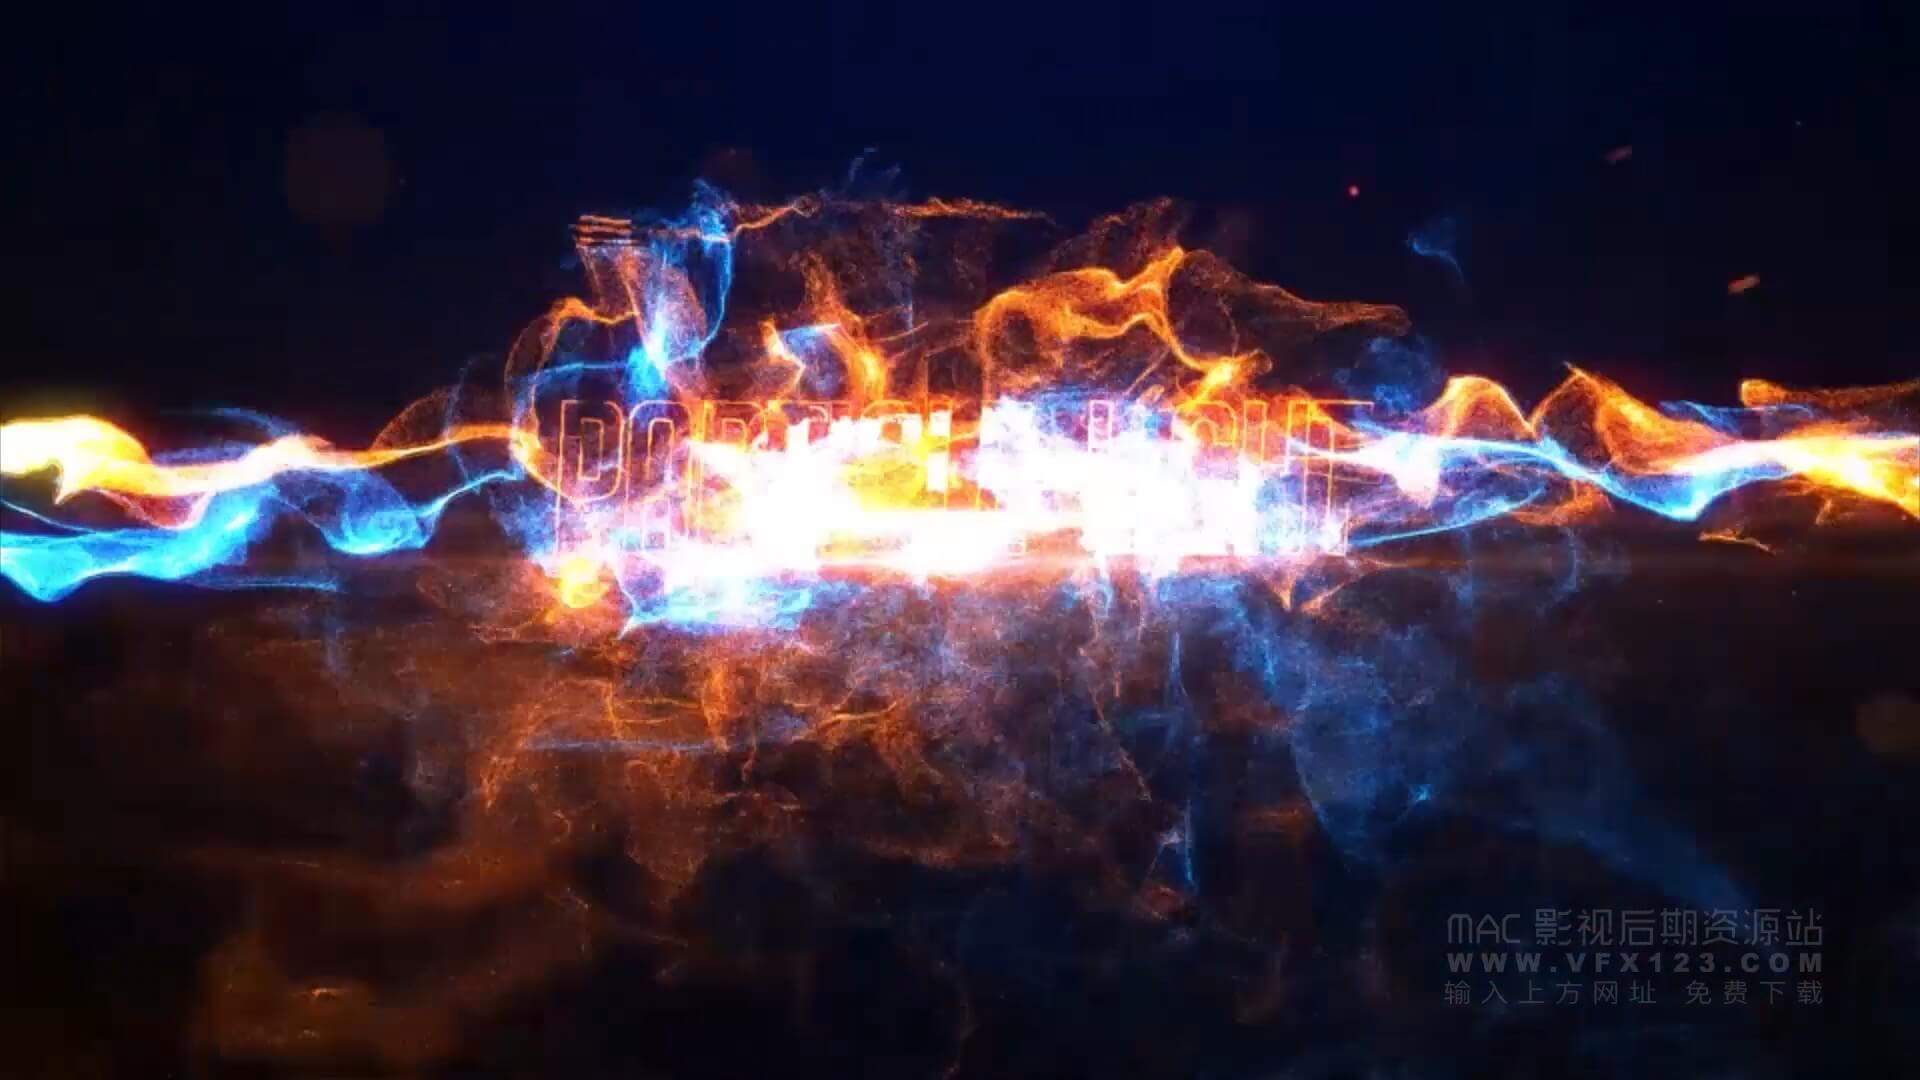 AE模板 震撼粒子效果徽标LOGO展示模板 Particle Light Reveal